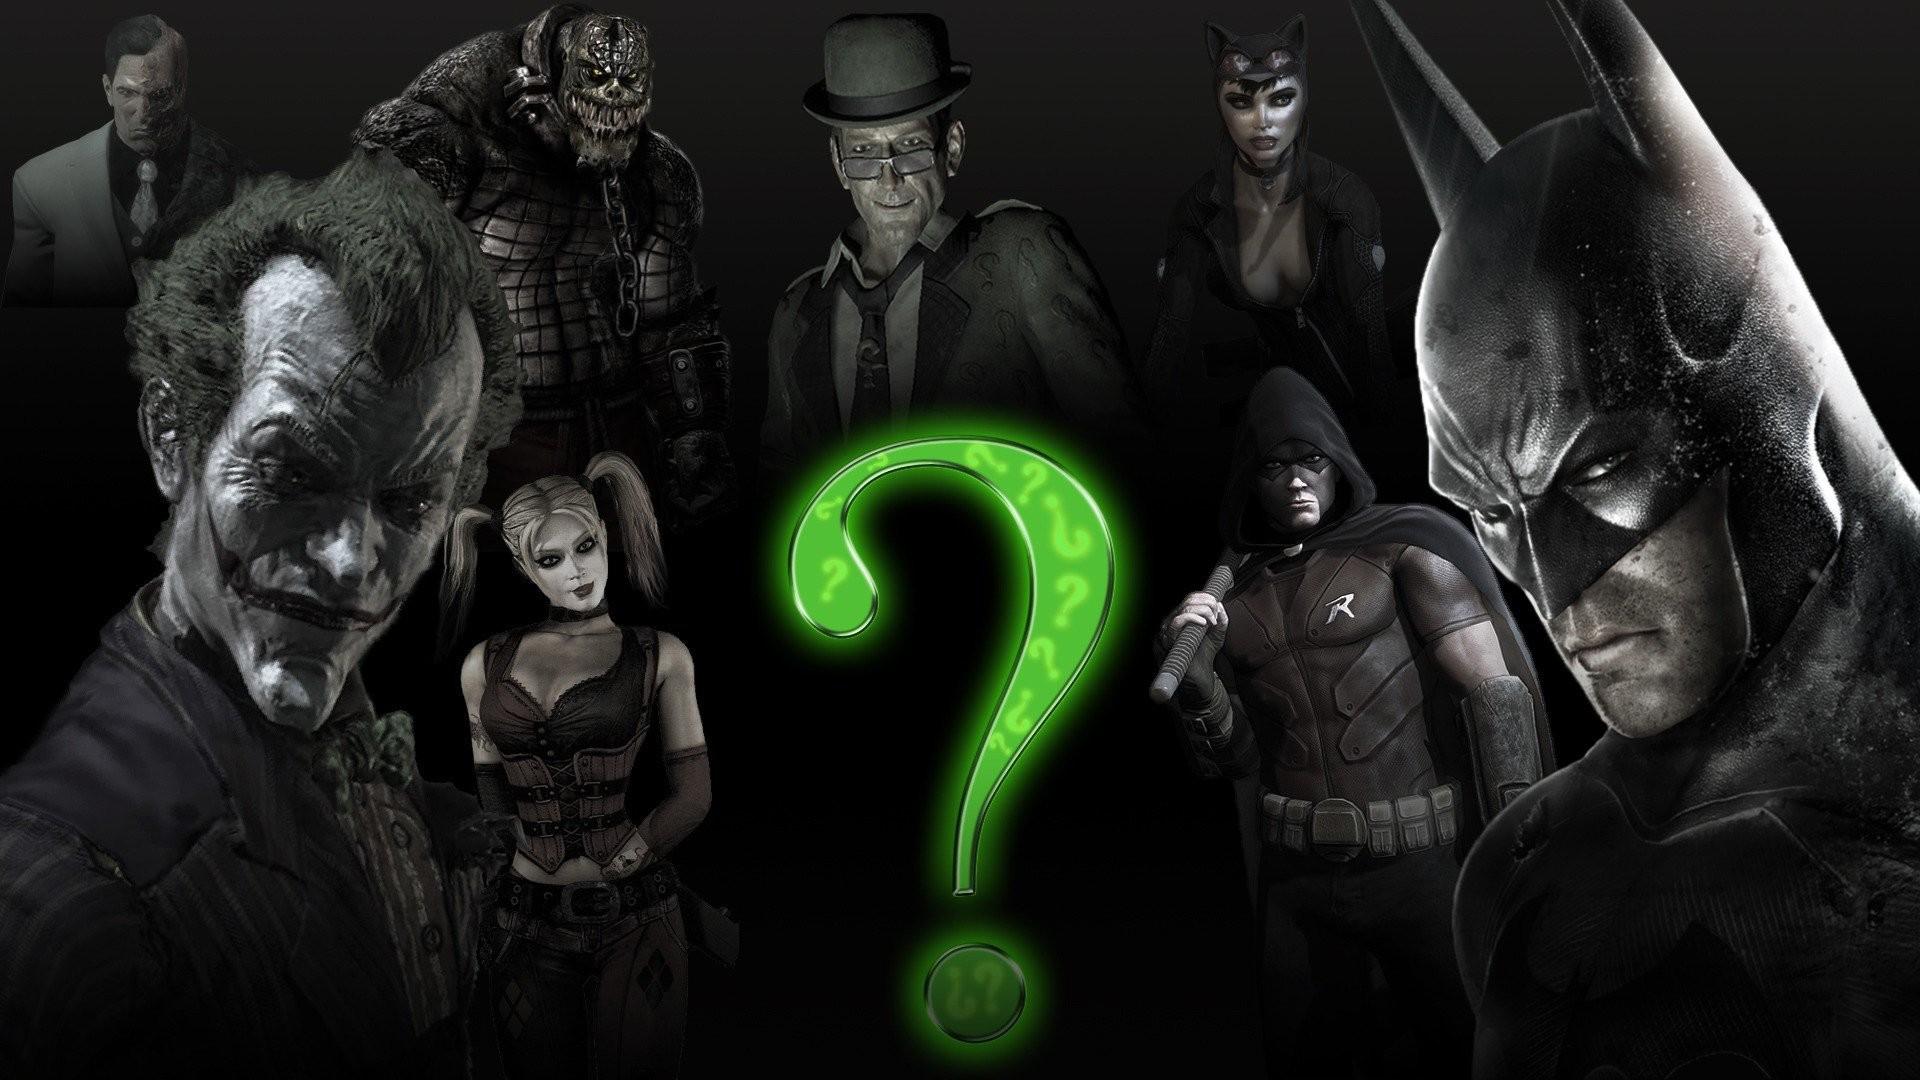 Batman Joker Harley Quinn The Riddler Killer Croc Arkham City Catwoman Two  Face Video Games